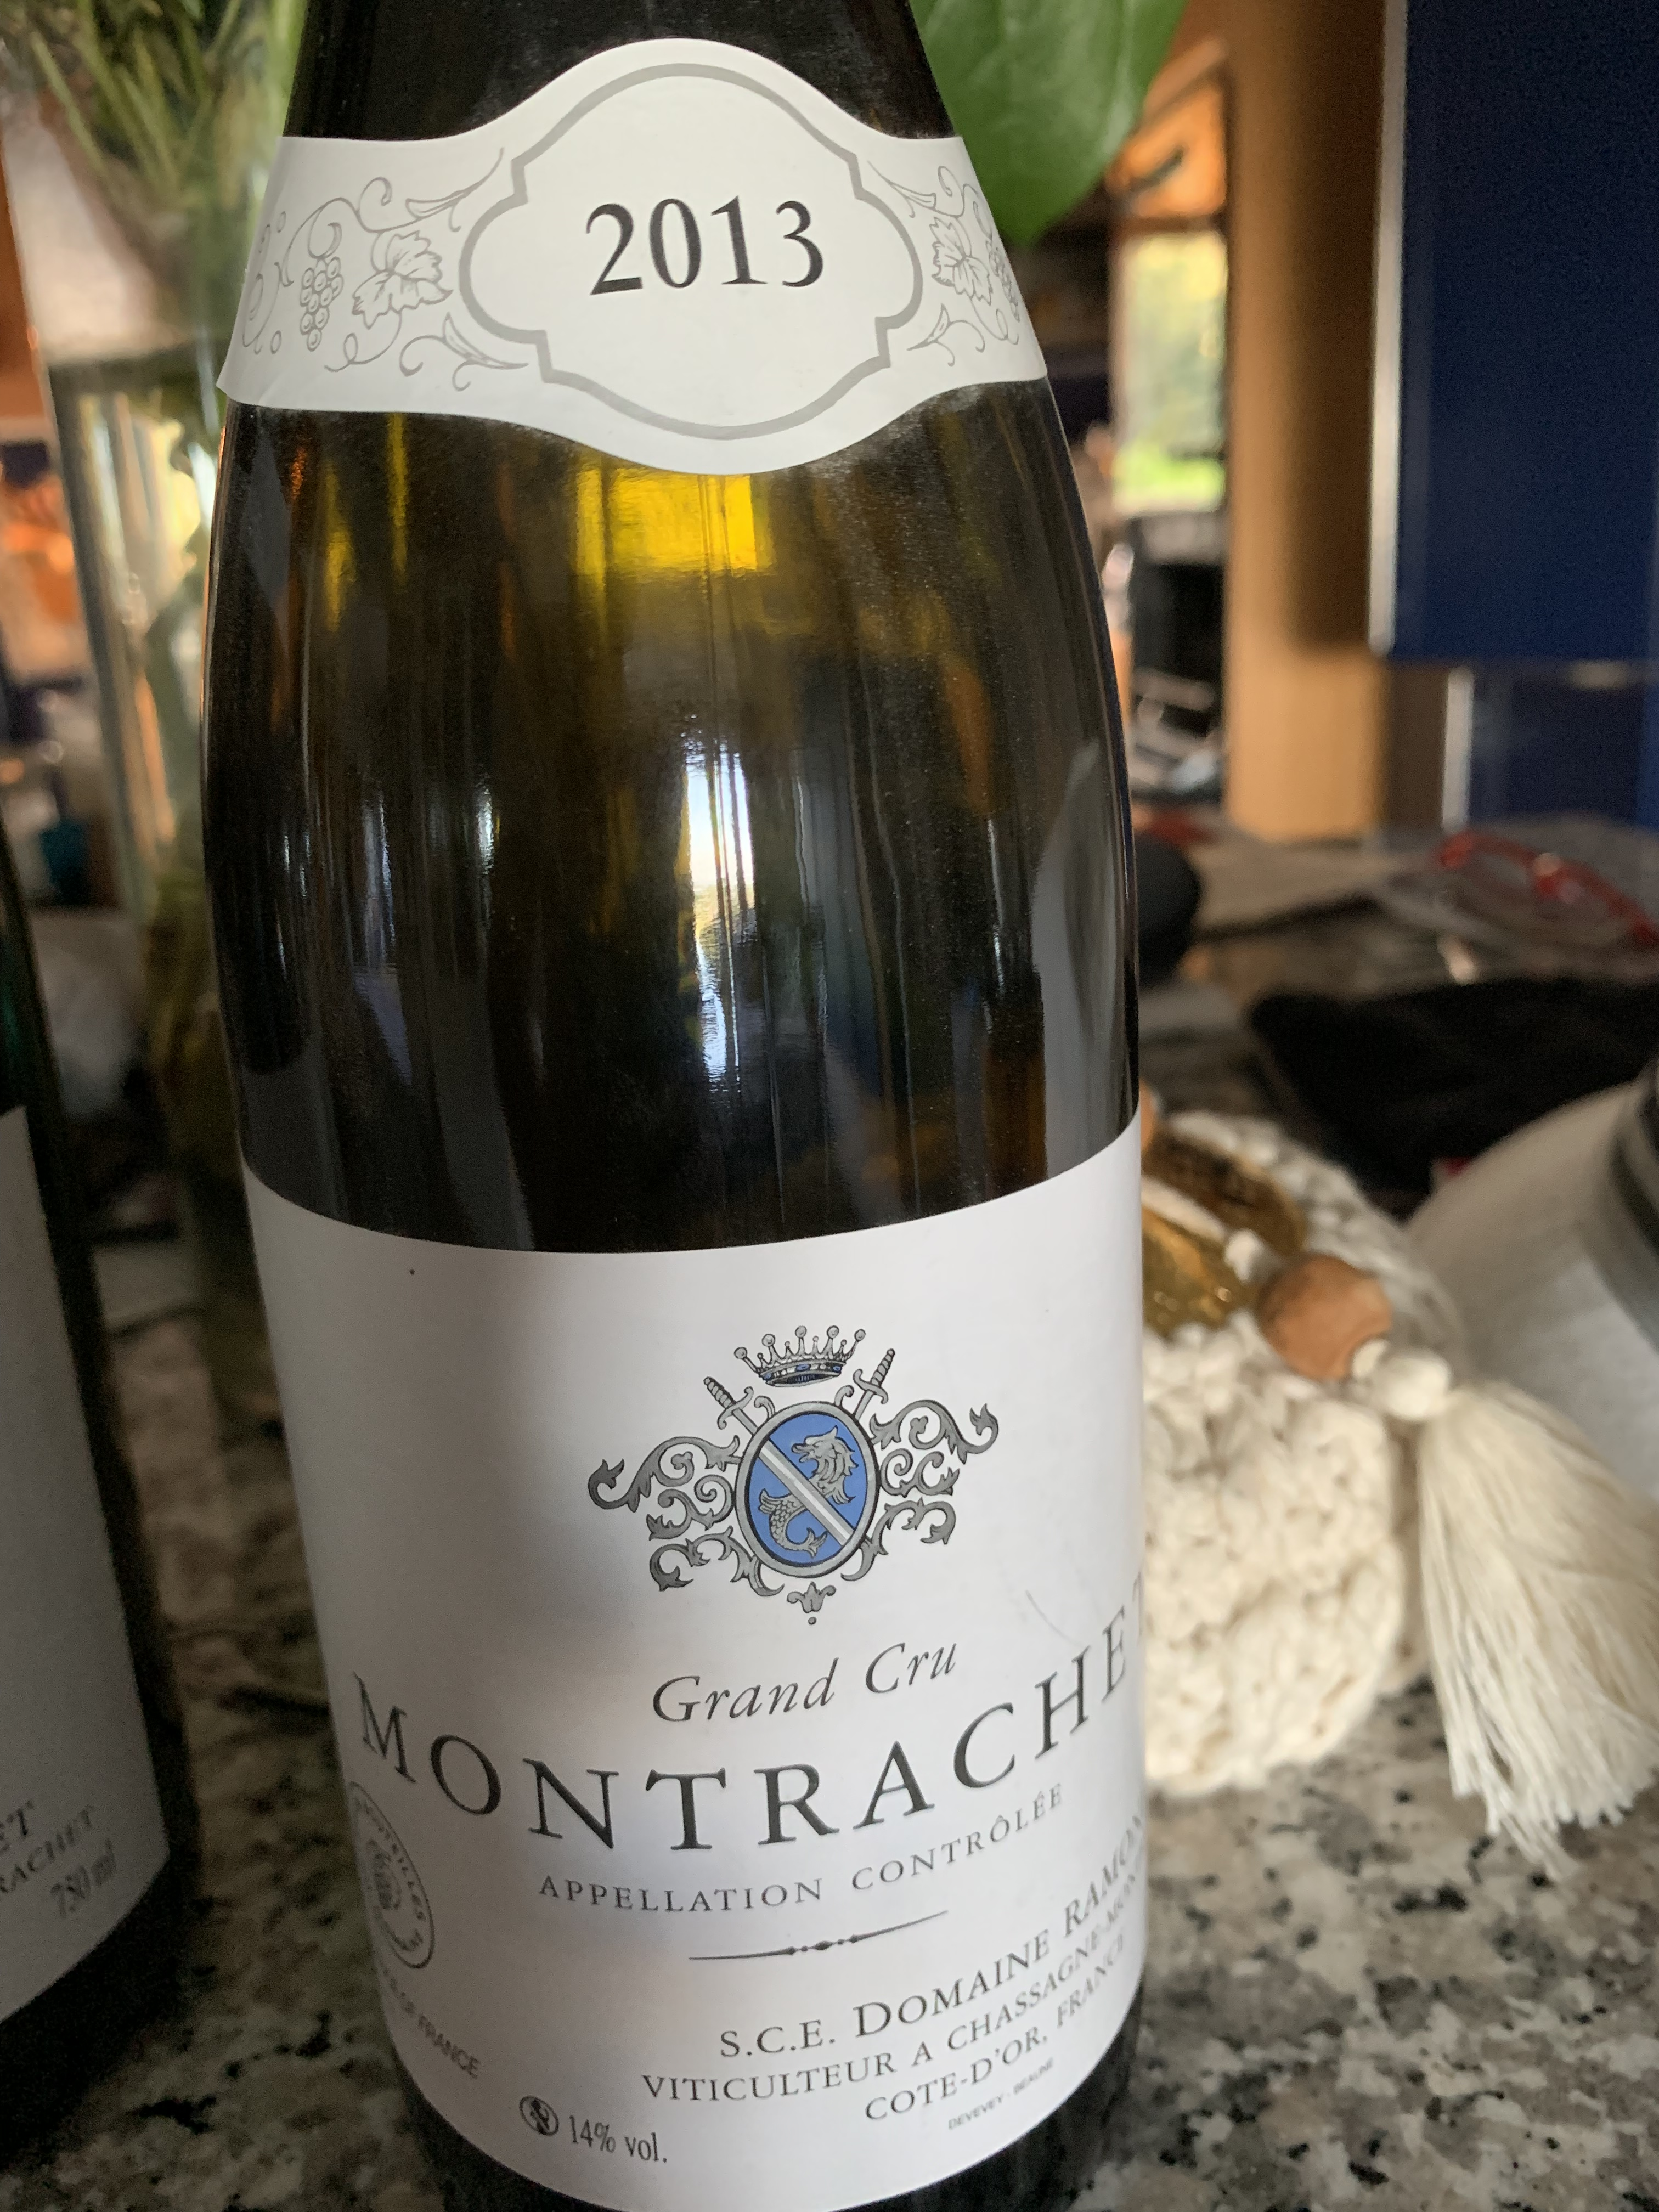 Montrachet Grand Cru 2013 Ramomo